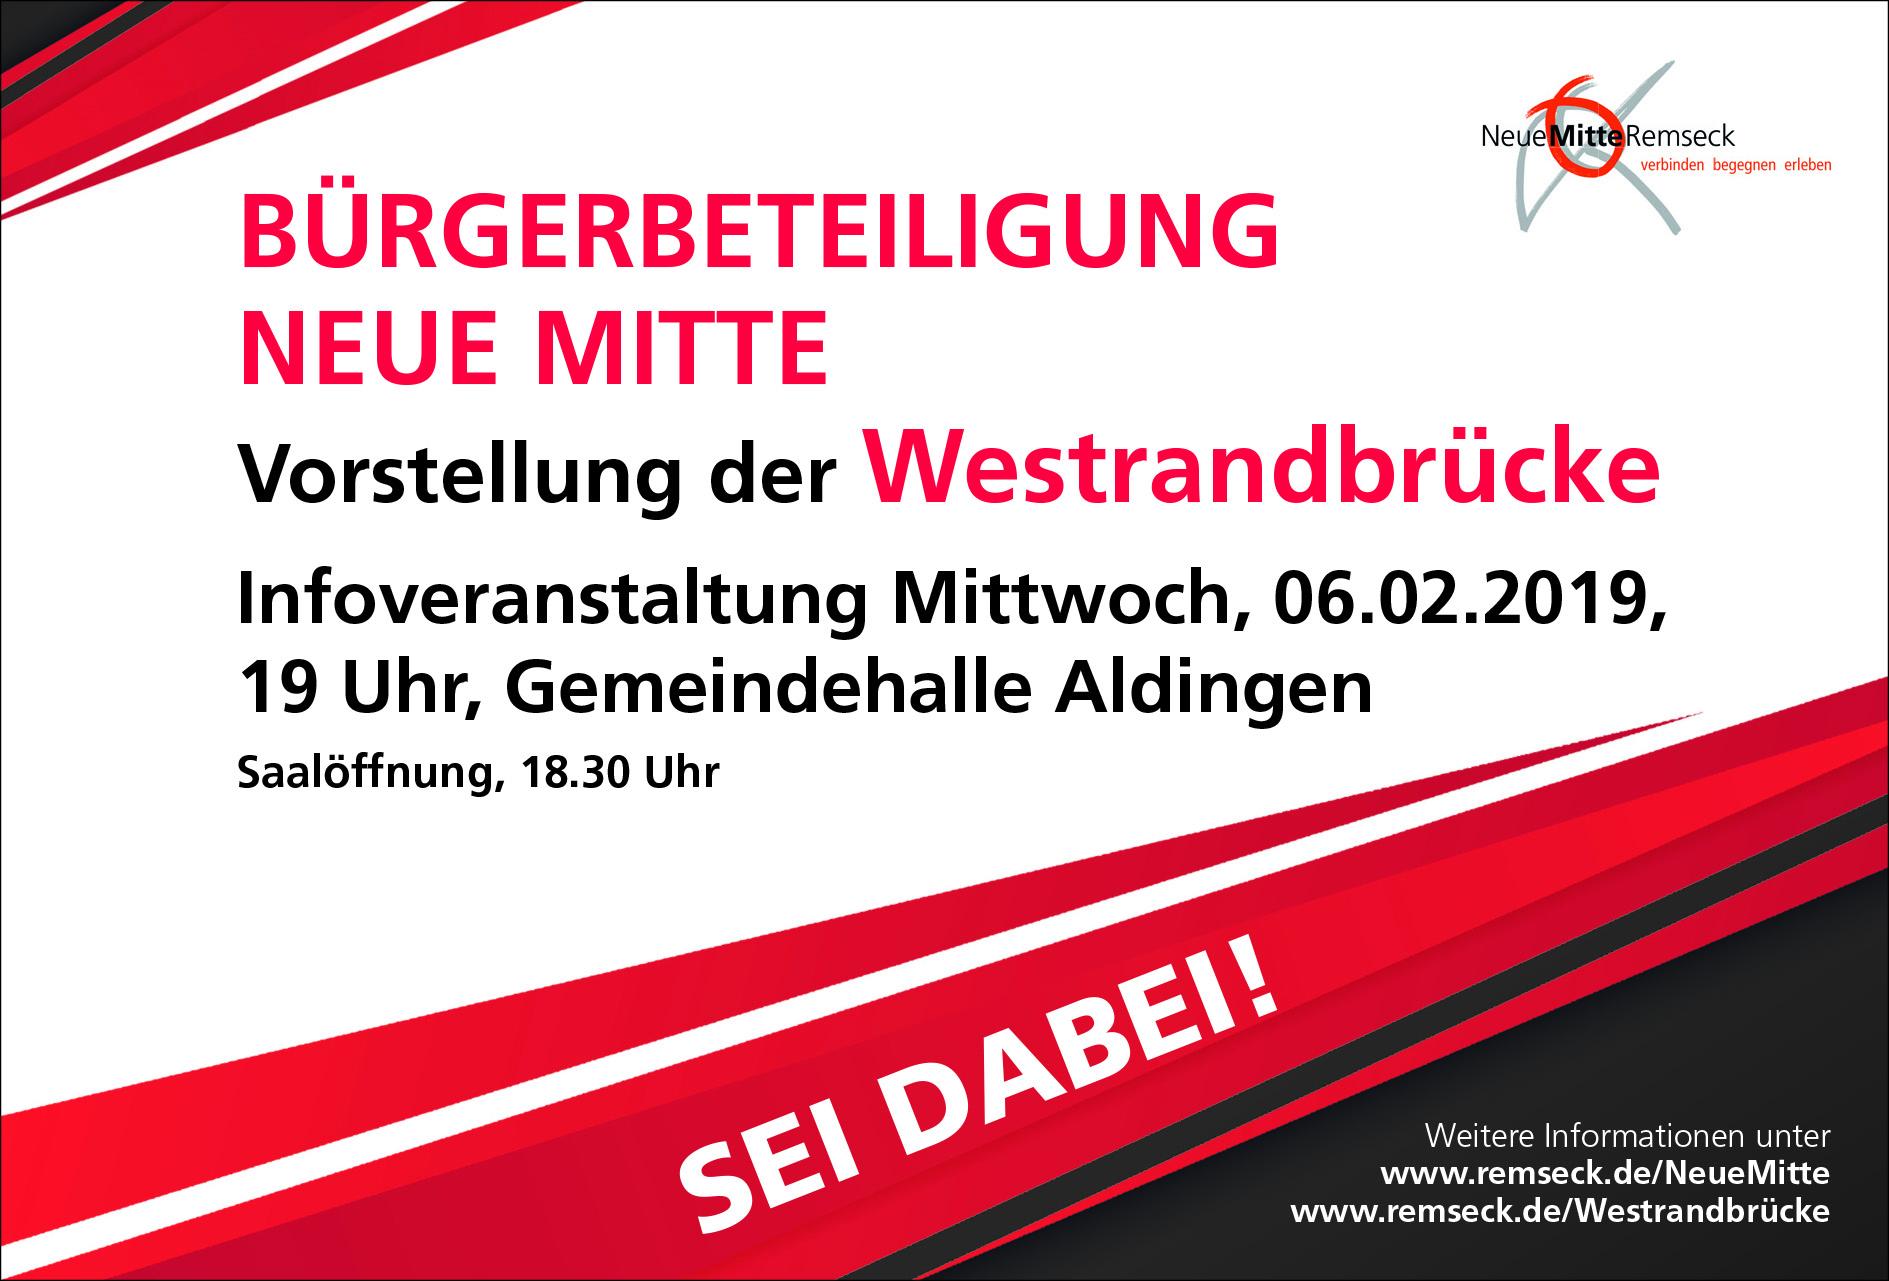 Plakat Vorstellung Westrandbrücke 06.02.2019